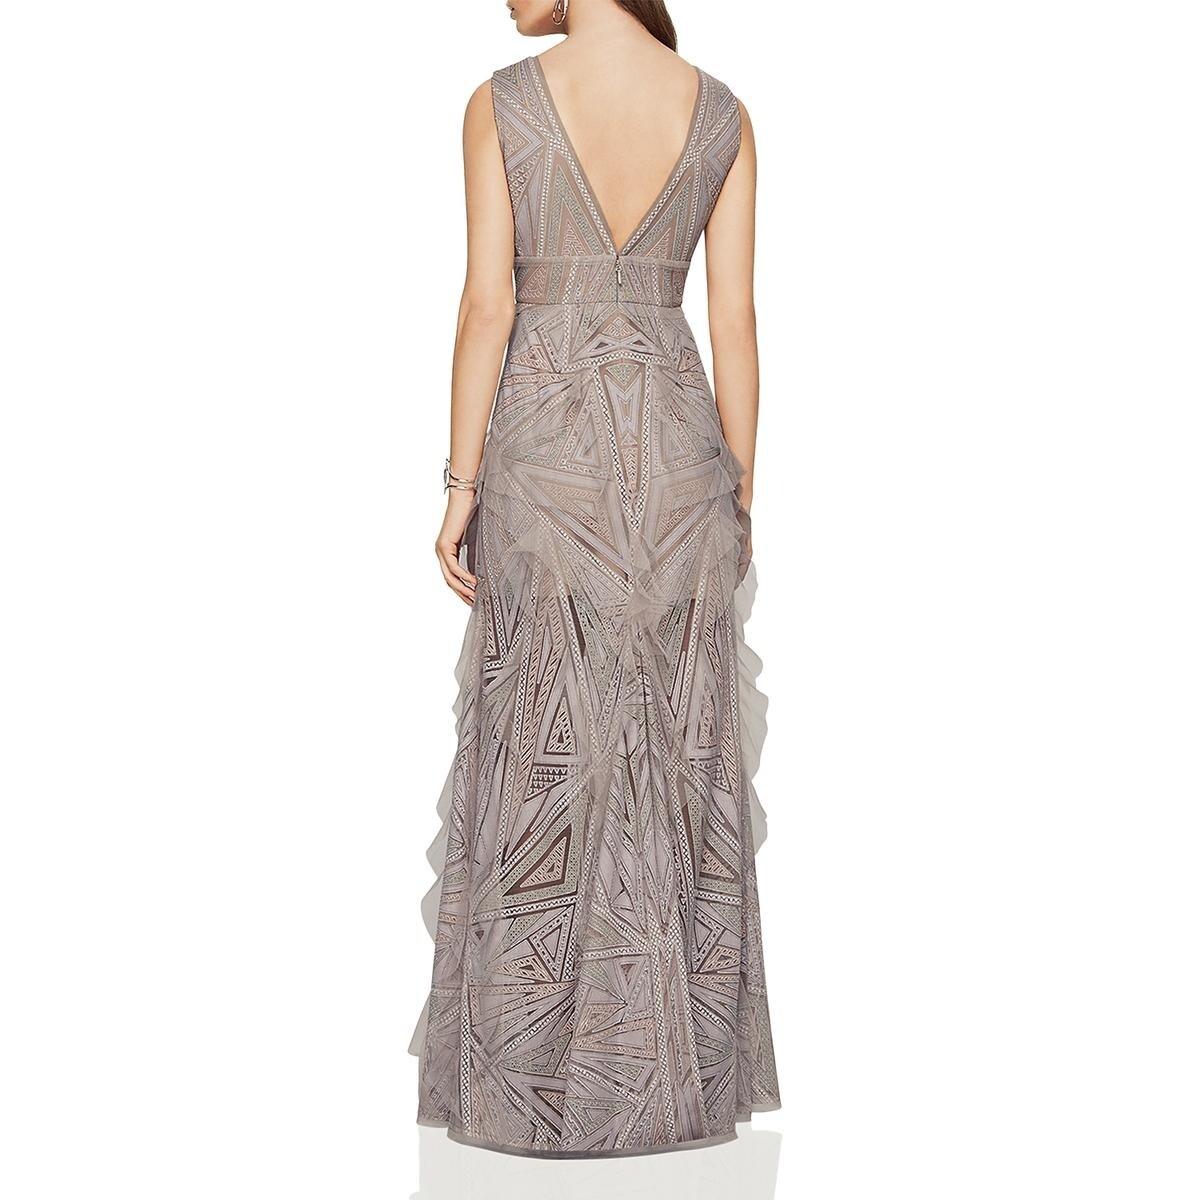 641a25623c11 Shop BCBG Max Azria Womens Aislinn Evening Dress Ruffled Lace - Free  Shipping Today - Overstock - 21145676